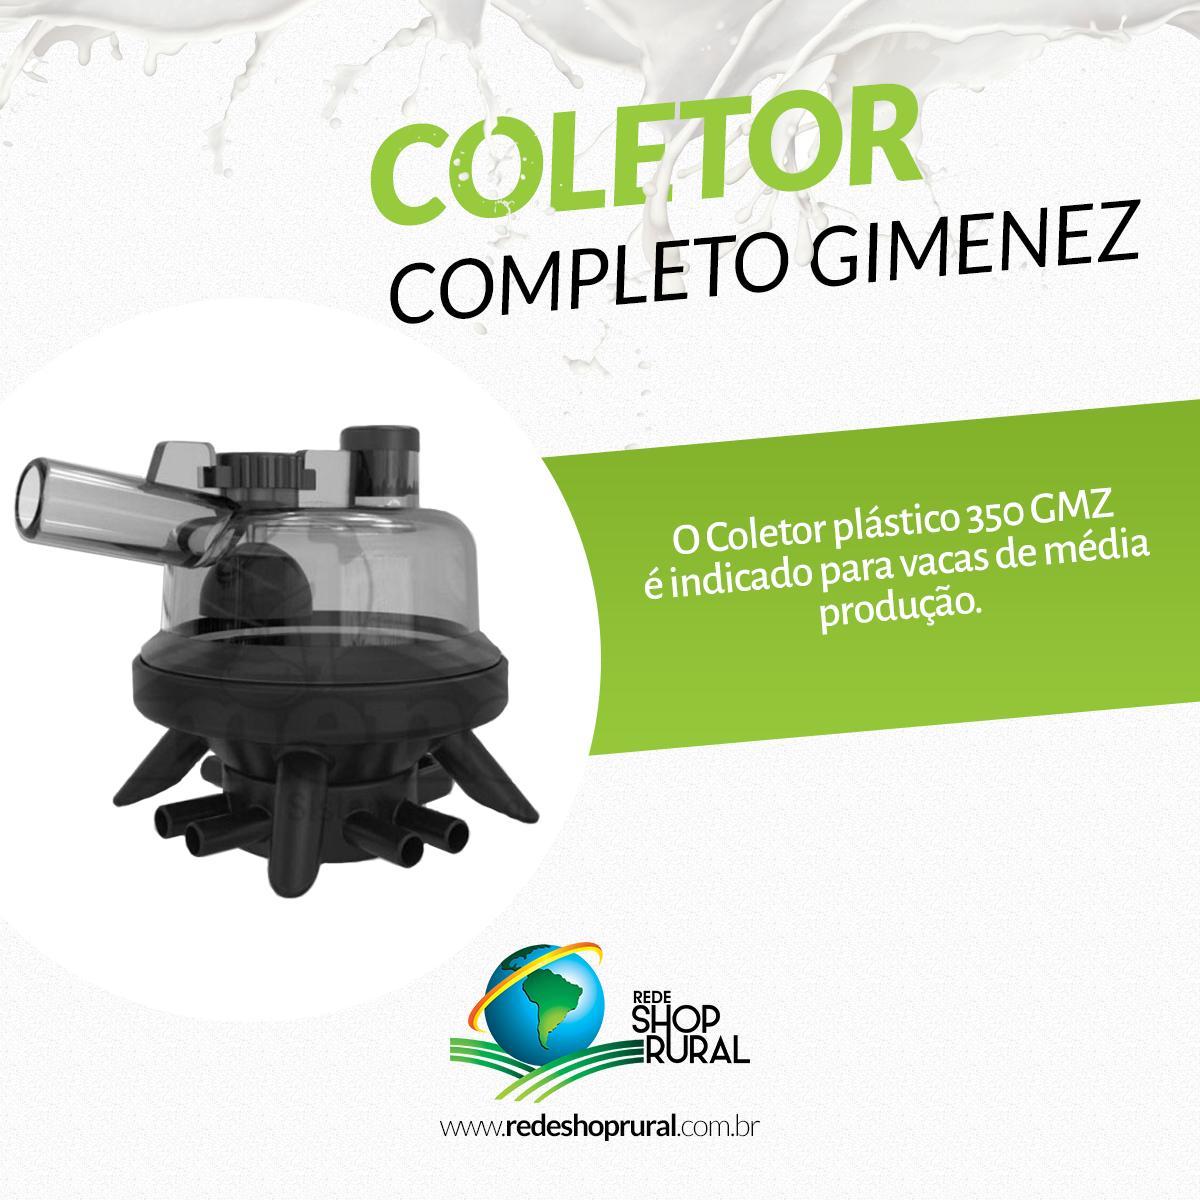 Coletor Completo Gimenez